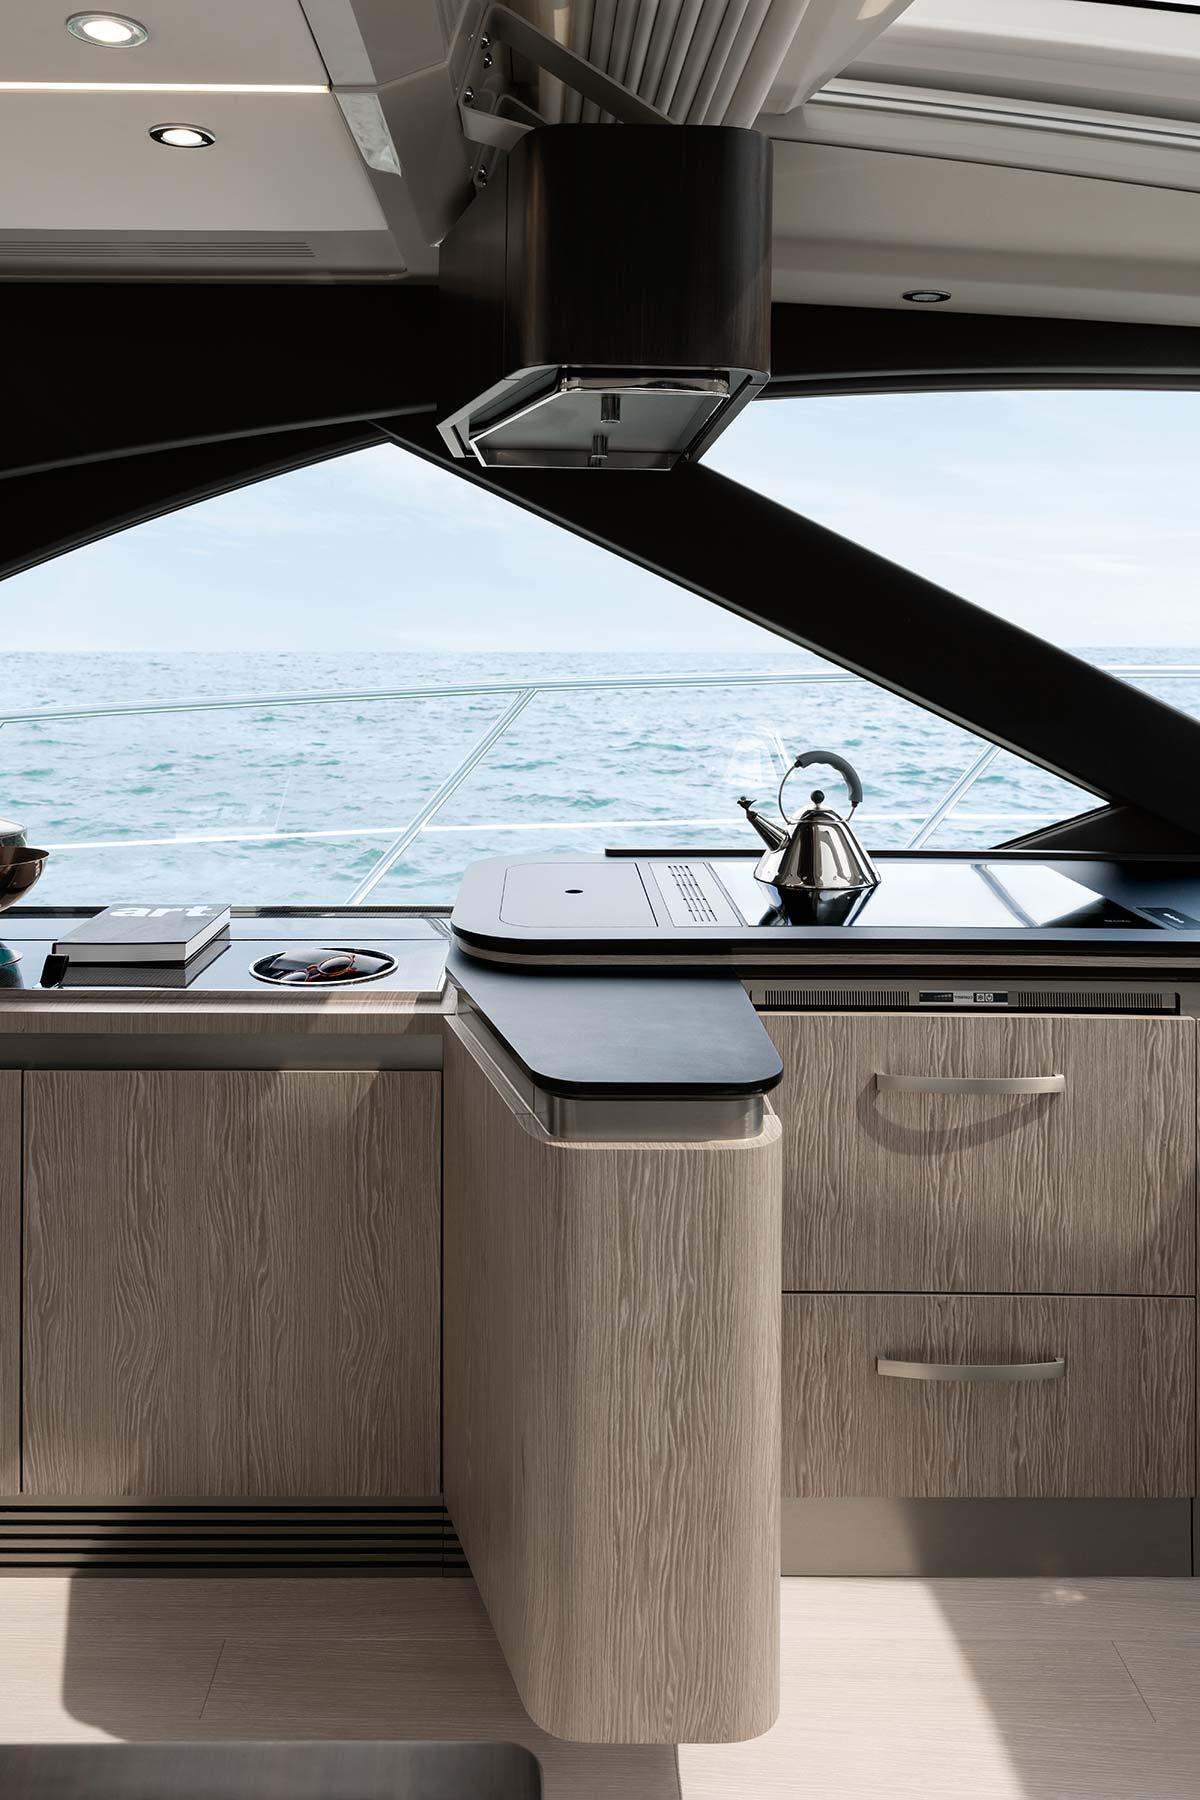 Kitchen top by Lapitec - Azimut S6